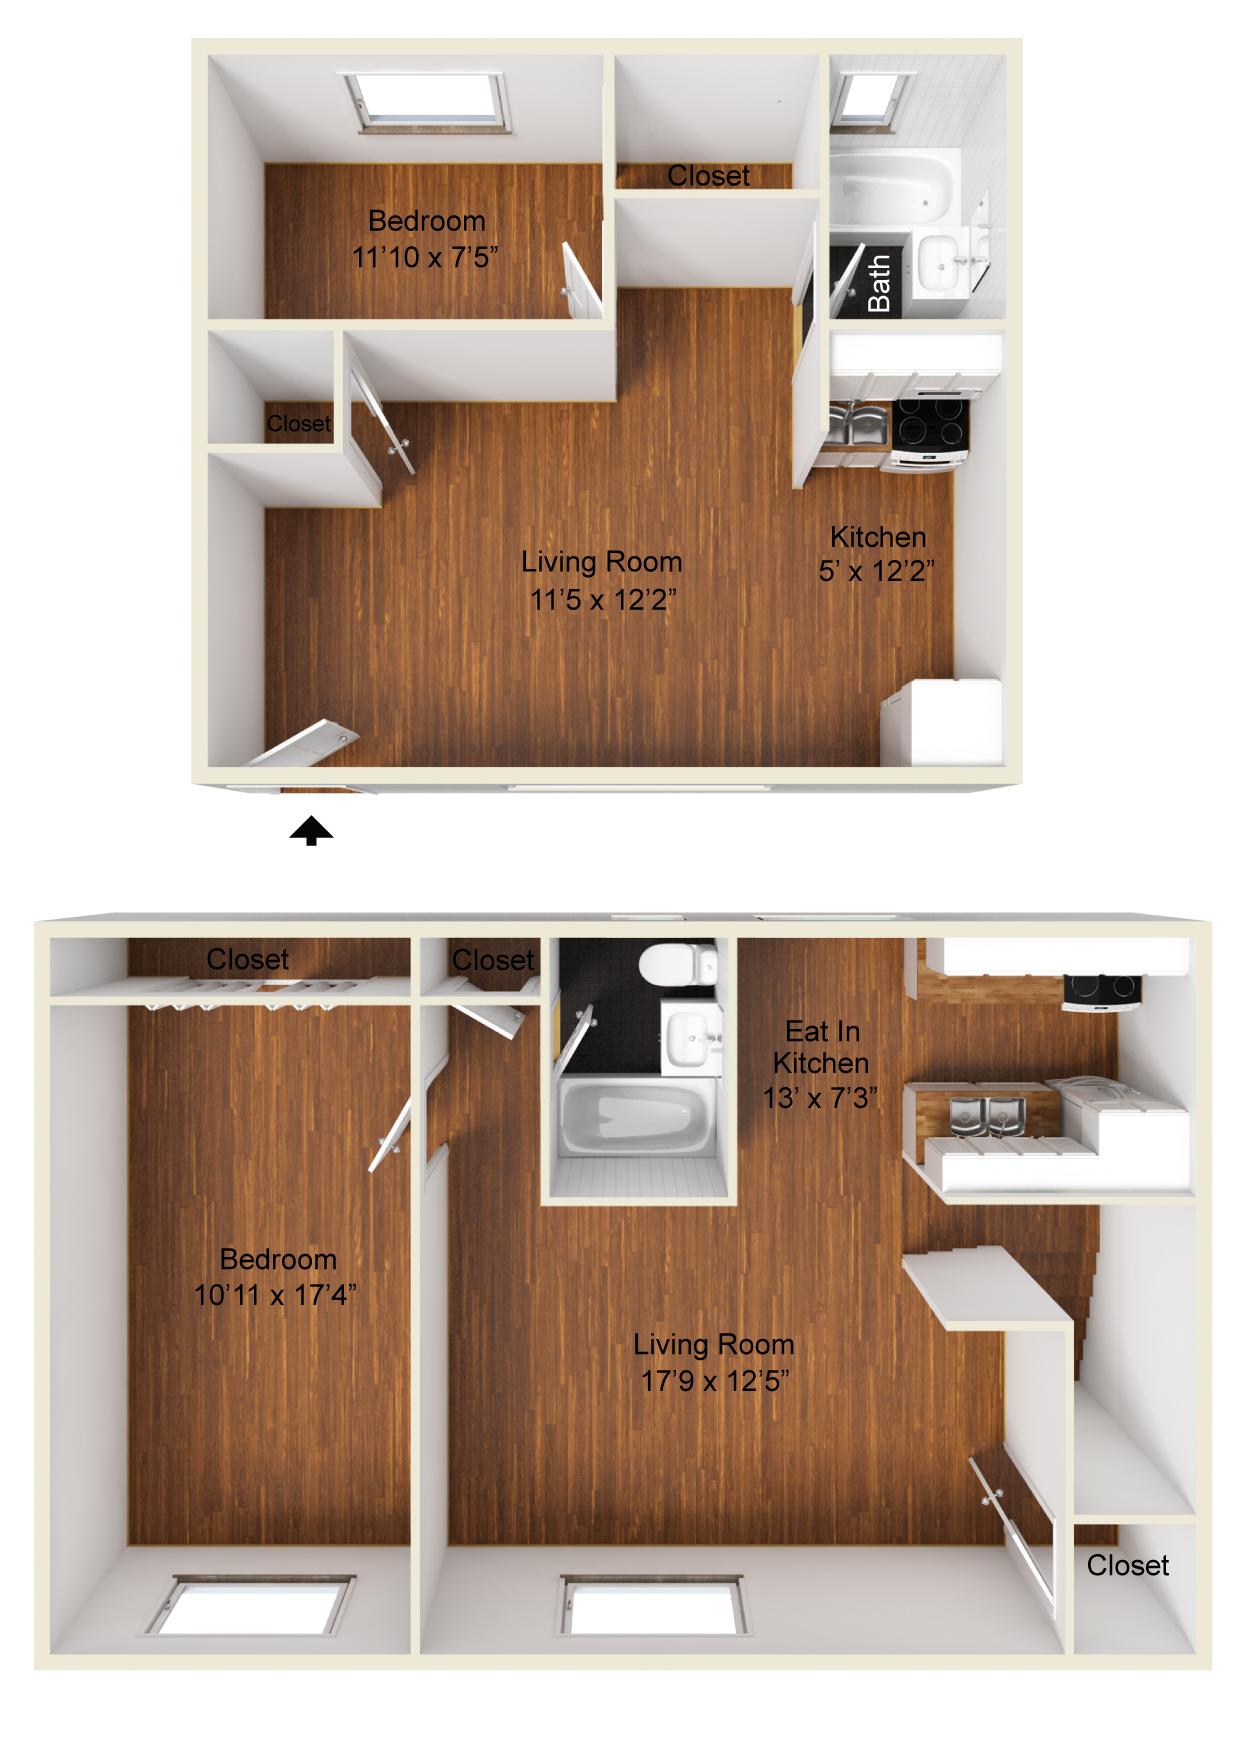 CJ Lombardo-Essex St Gardens-Small 1 bedroom, One bedroom 3D Unfurnished.jpg